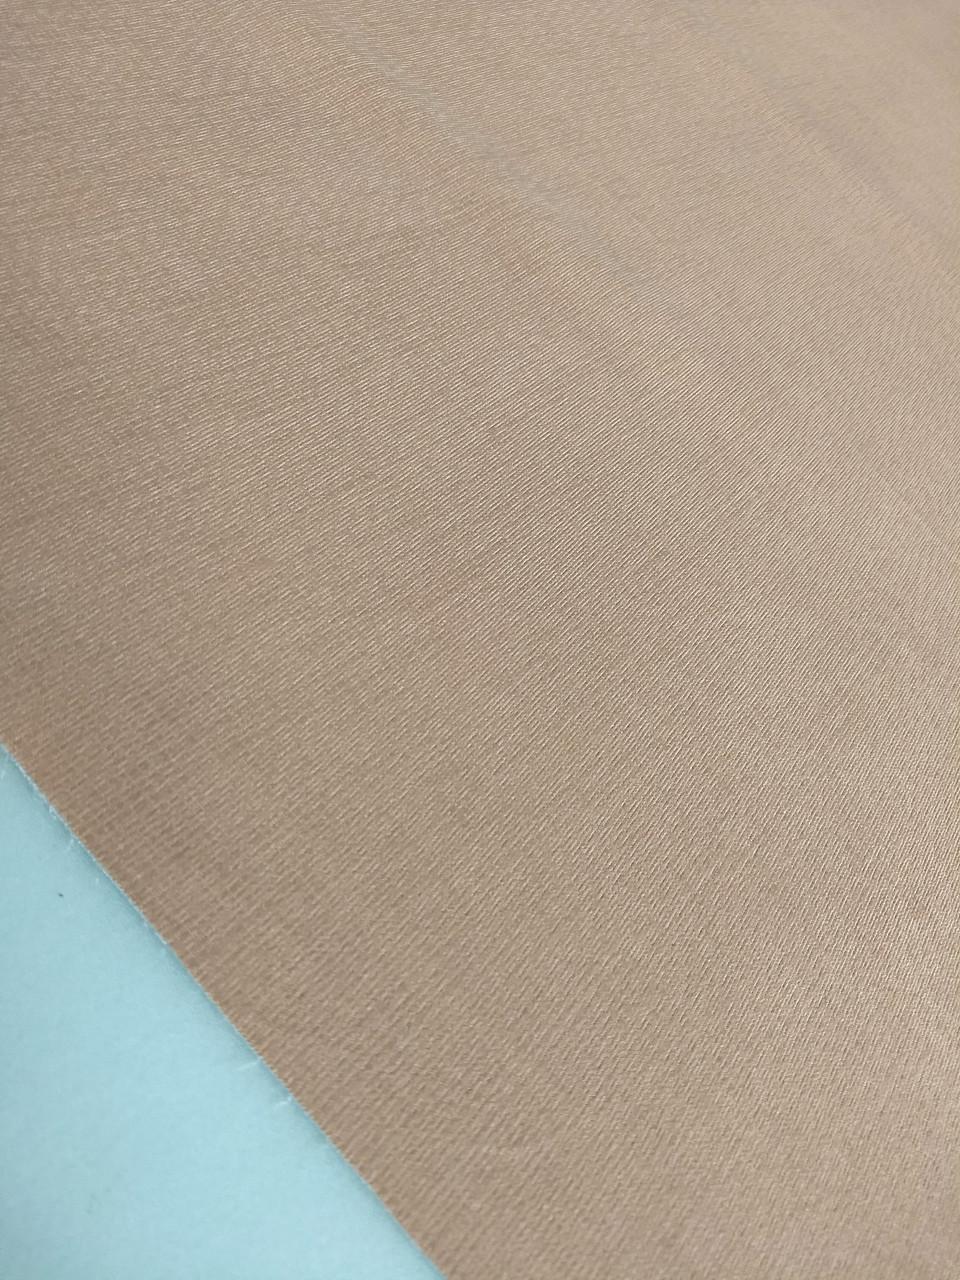 Ткань для обивки мебели Тида 03